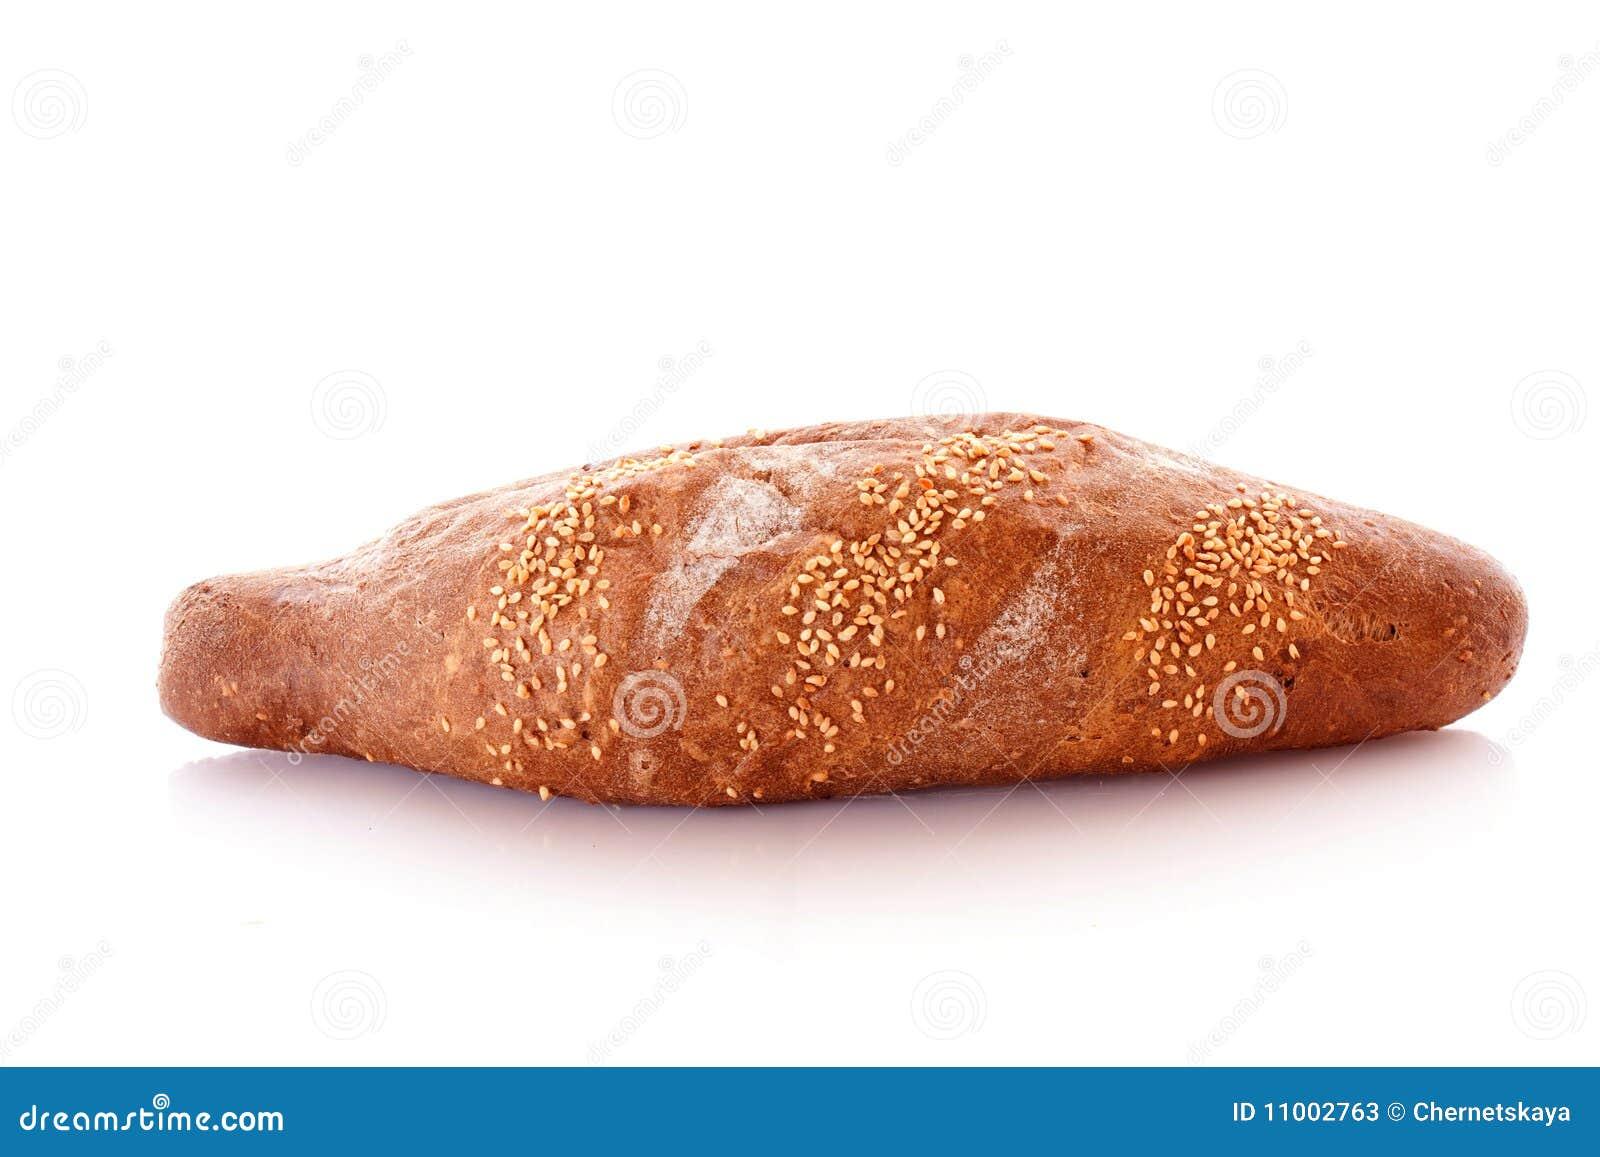 Bröd släntrar